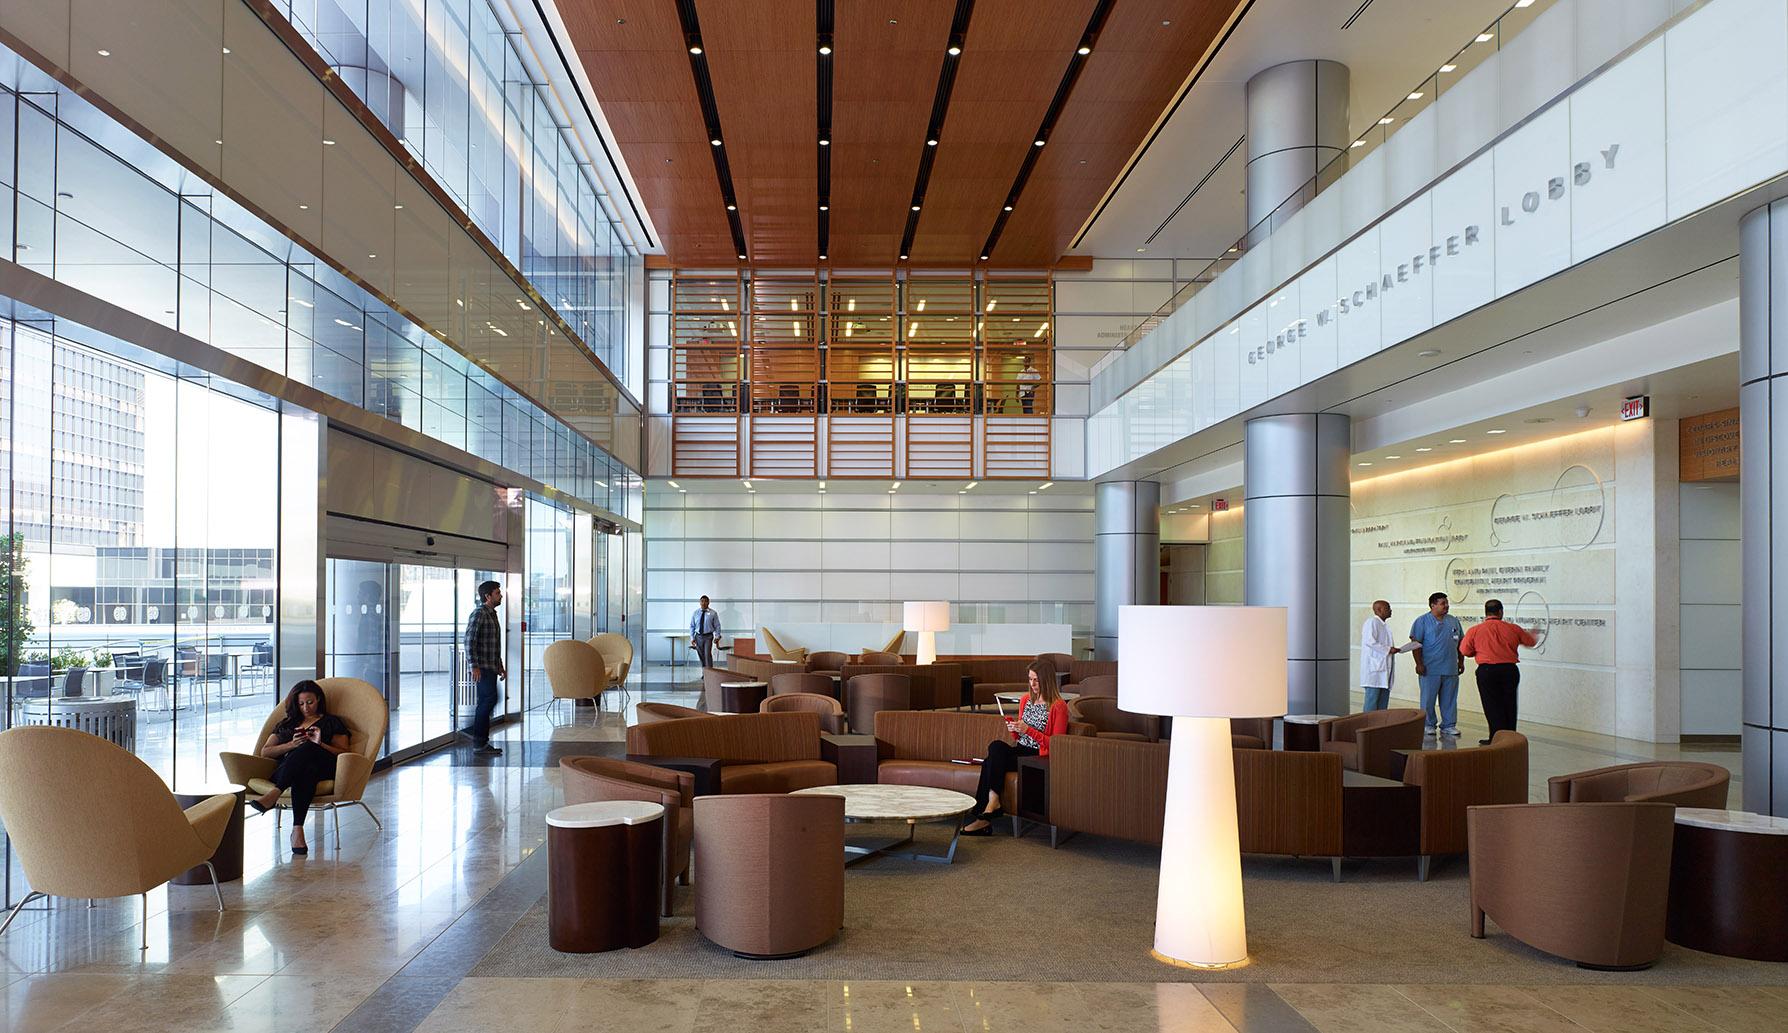 Cedars-Sinai Medical Center Advanced Health Sciences